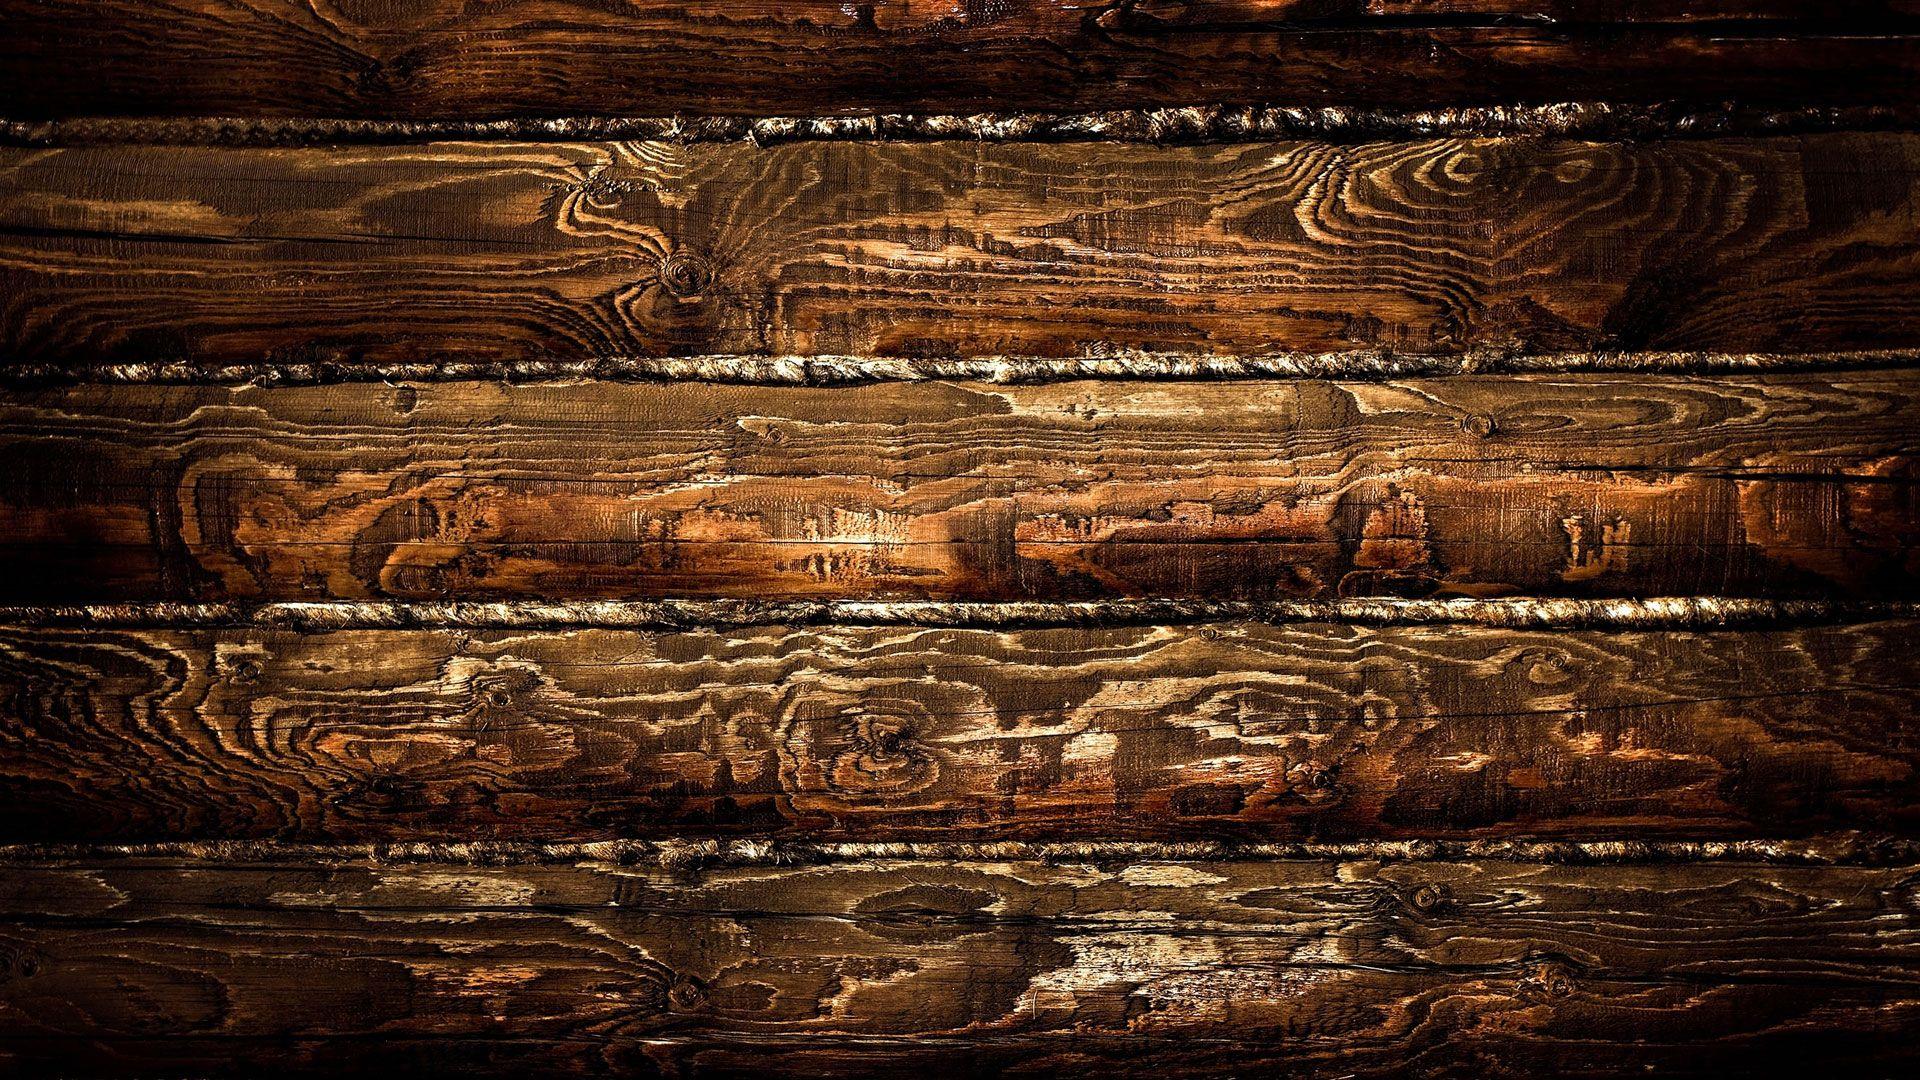 Old Barn Wood For Sale Barn Board Barn Siding Reclaimed Lumber Photography Backdrops Studio Backdrops Dark Wood Texture